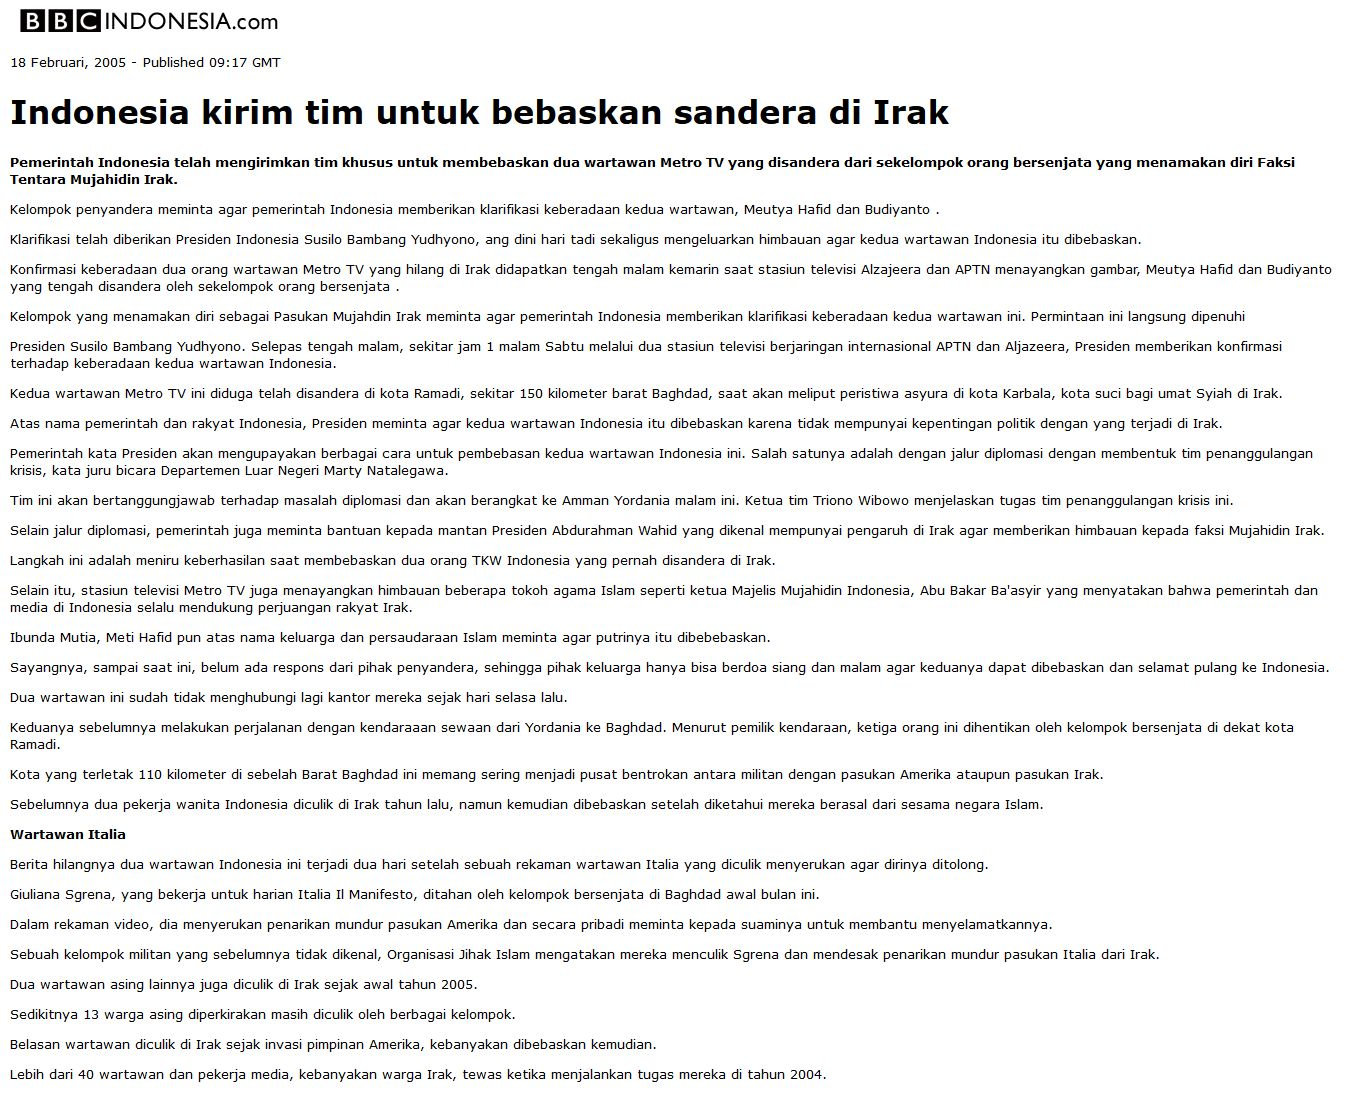 Jasa Ustadz Abu Bakar Ba'asyir bebaskan sandera Berita BBC